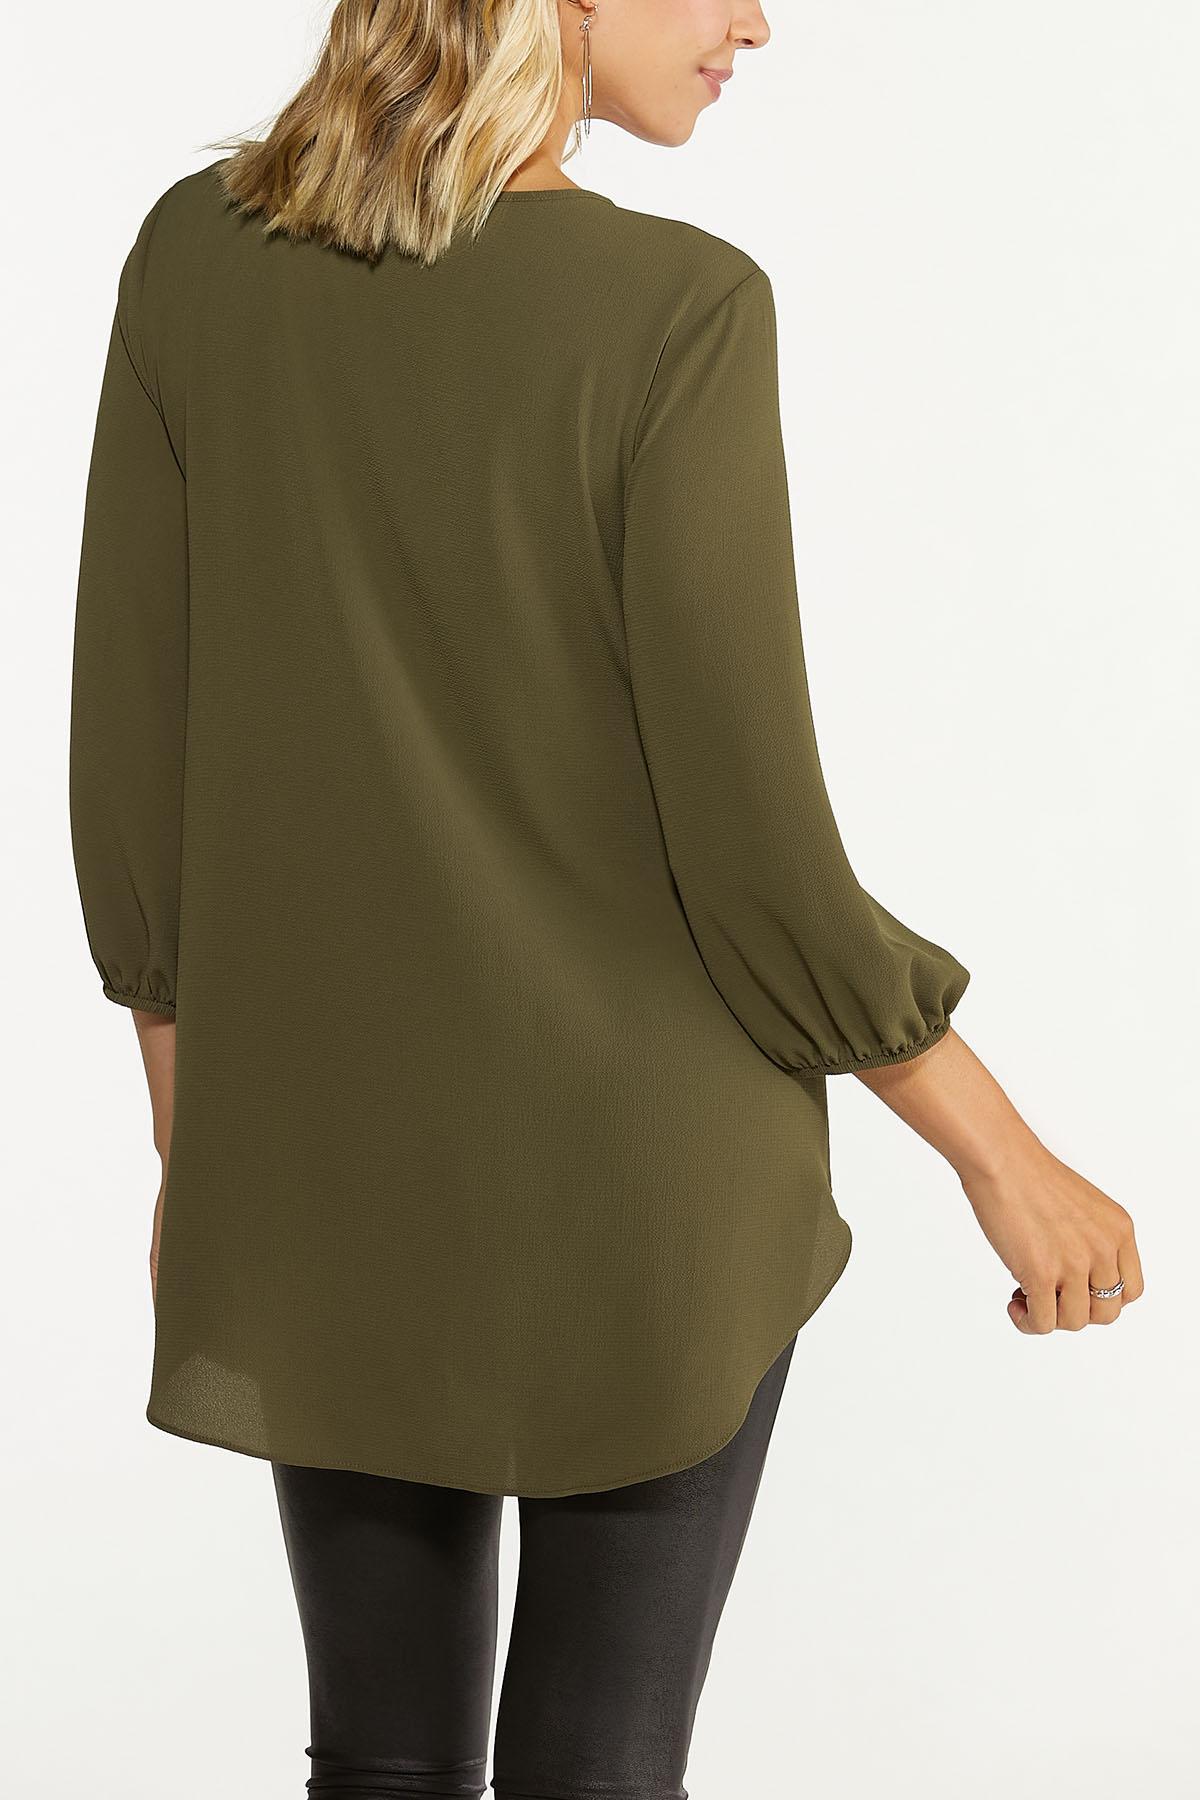 Plus Size Olive Crepe Tunic (Item #44739380)